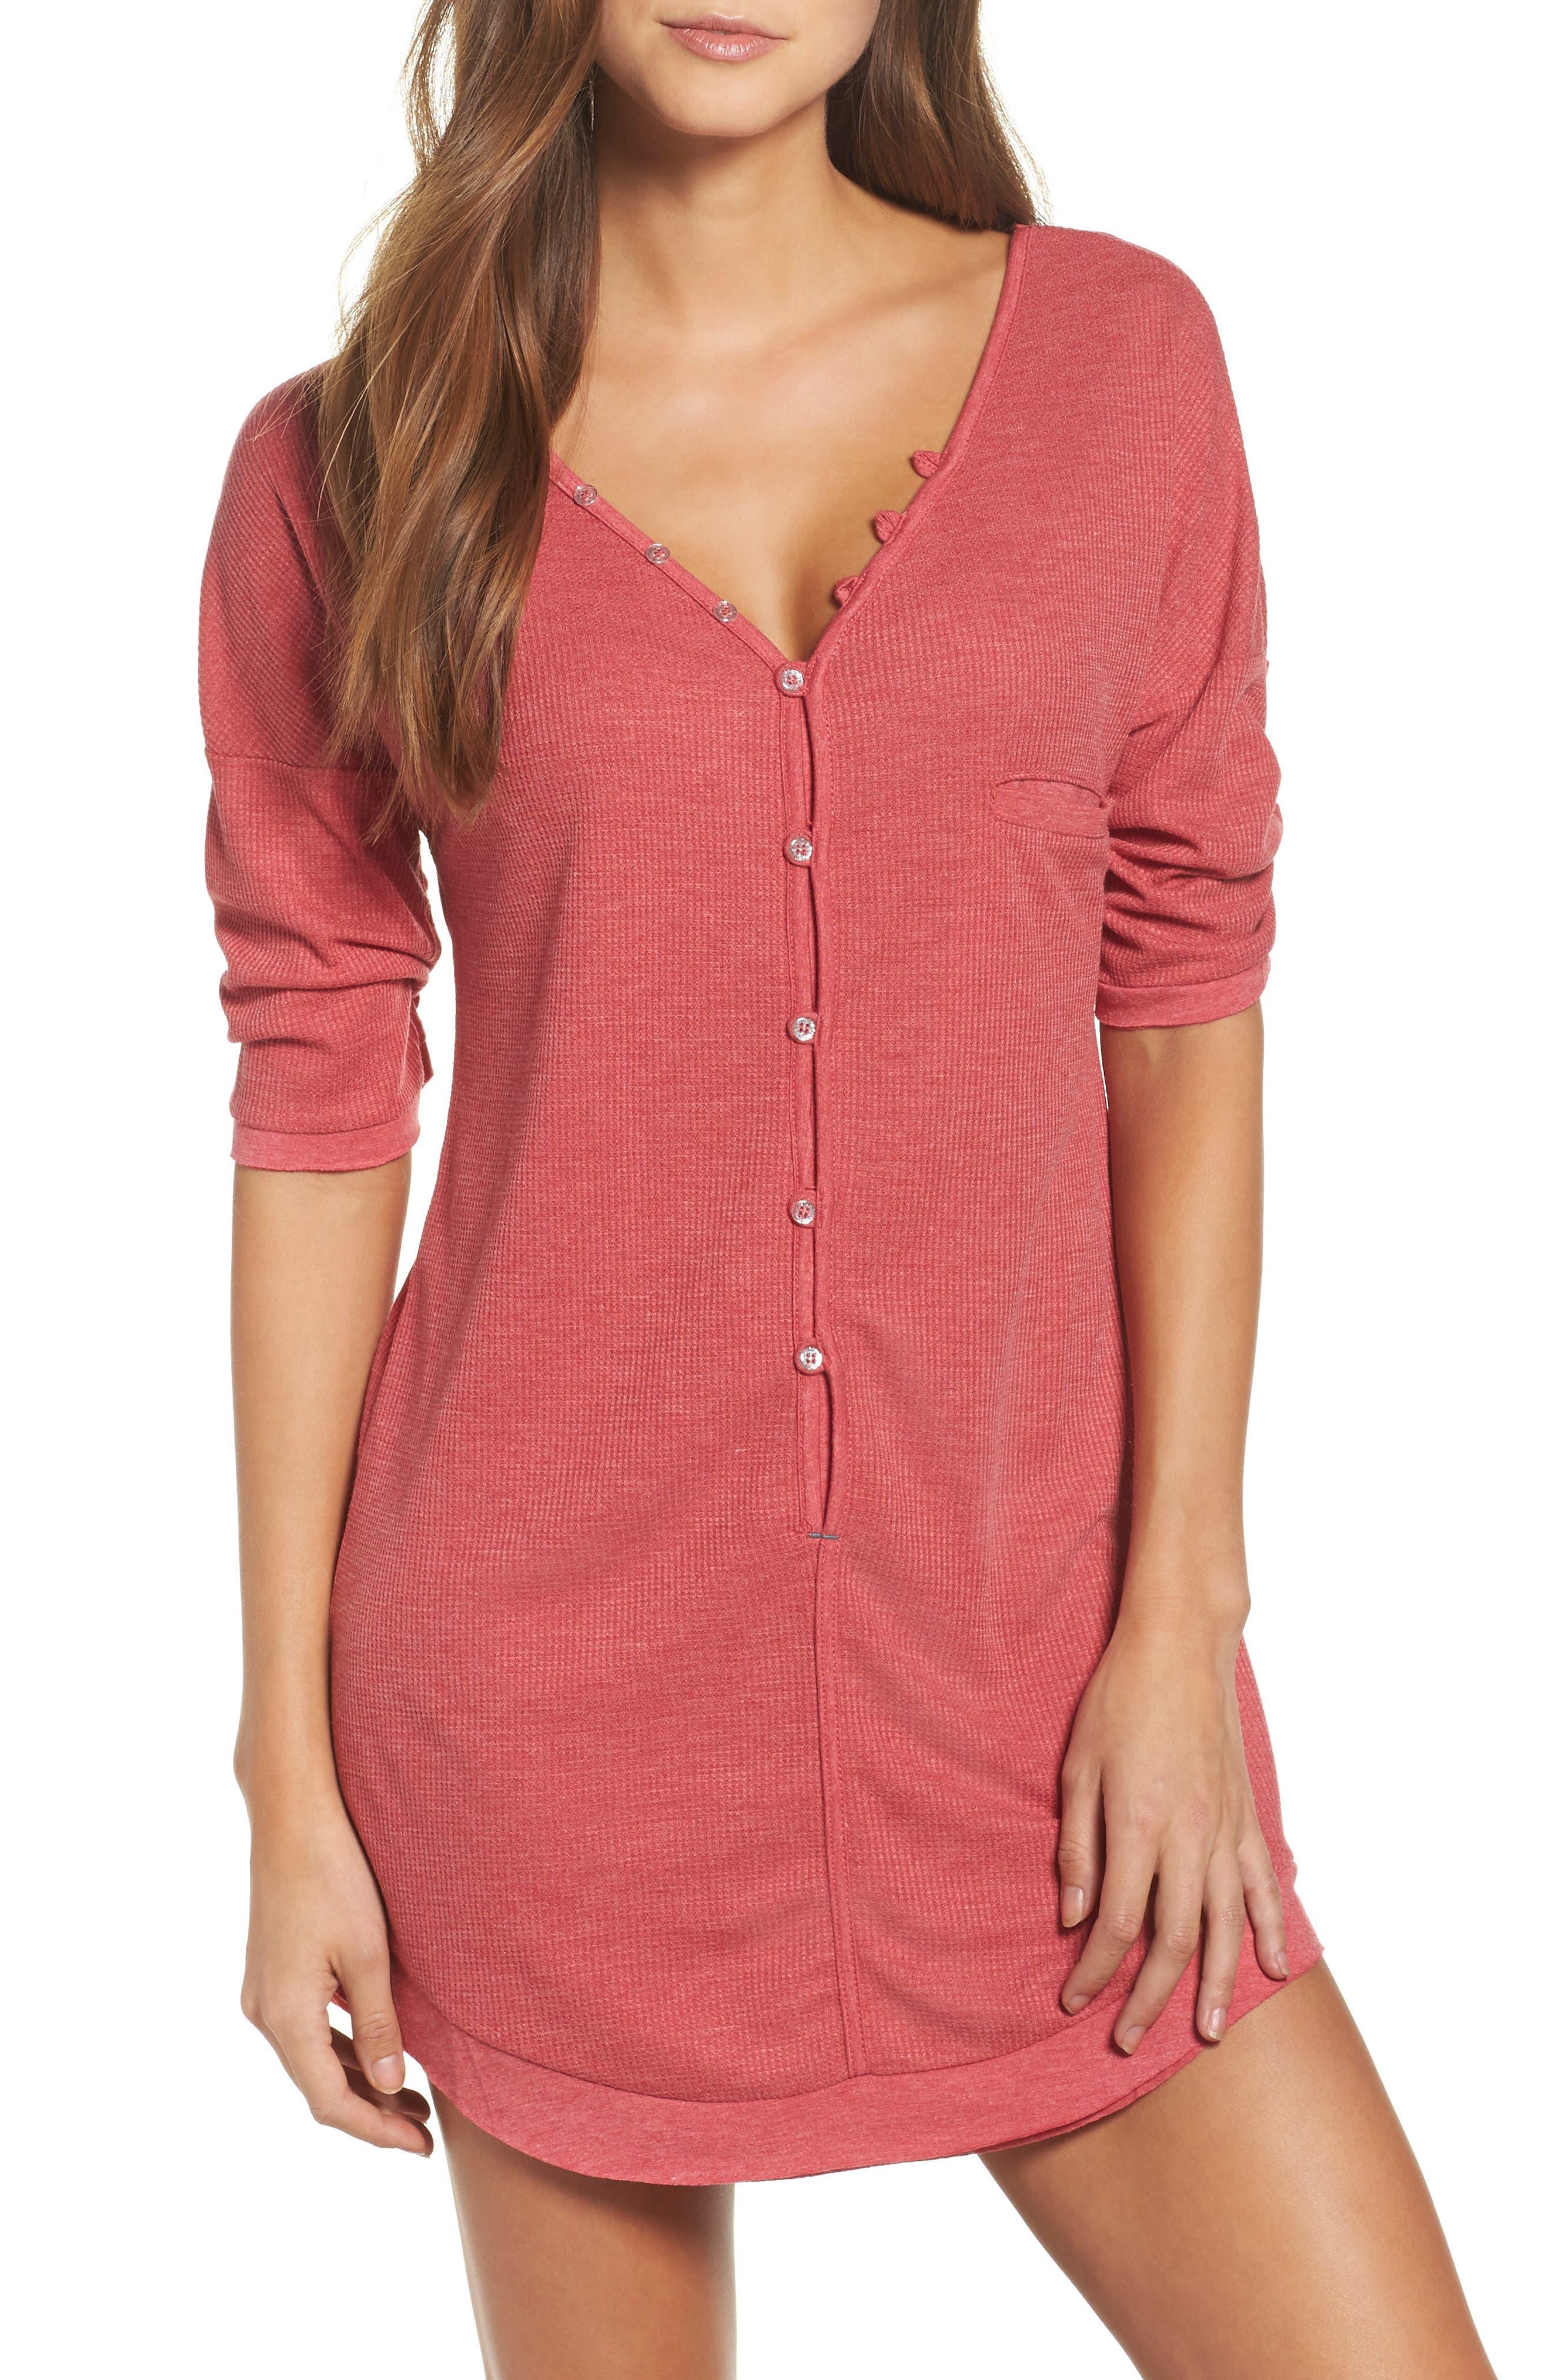 Honeydew Intimates Sleep Shirt